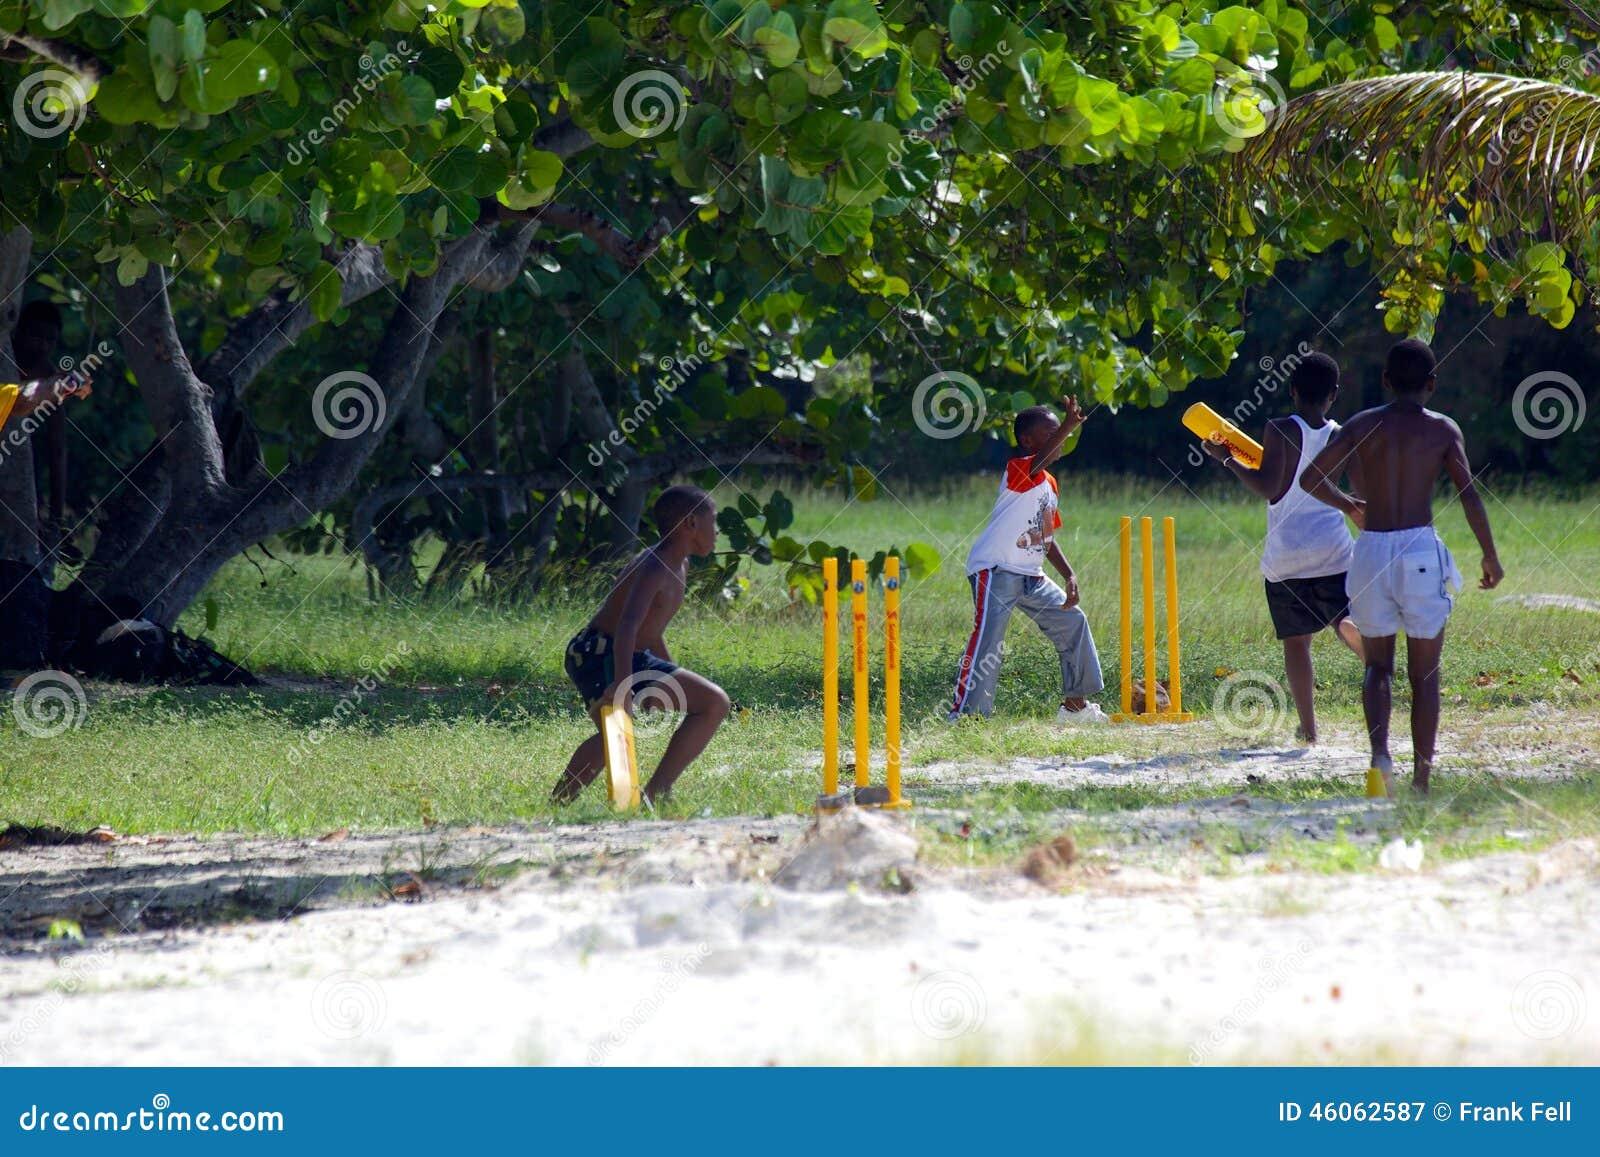 Índias Ocidentais, as Caraíbas, Antígua, St Mary, praia de Ffryes, jovens que jogam o grilo na praia